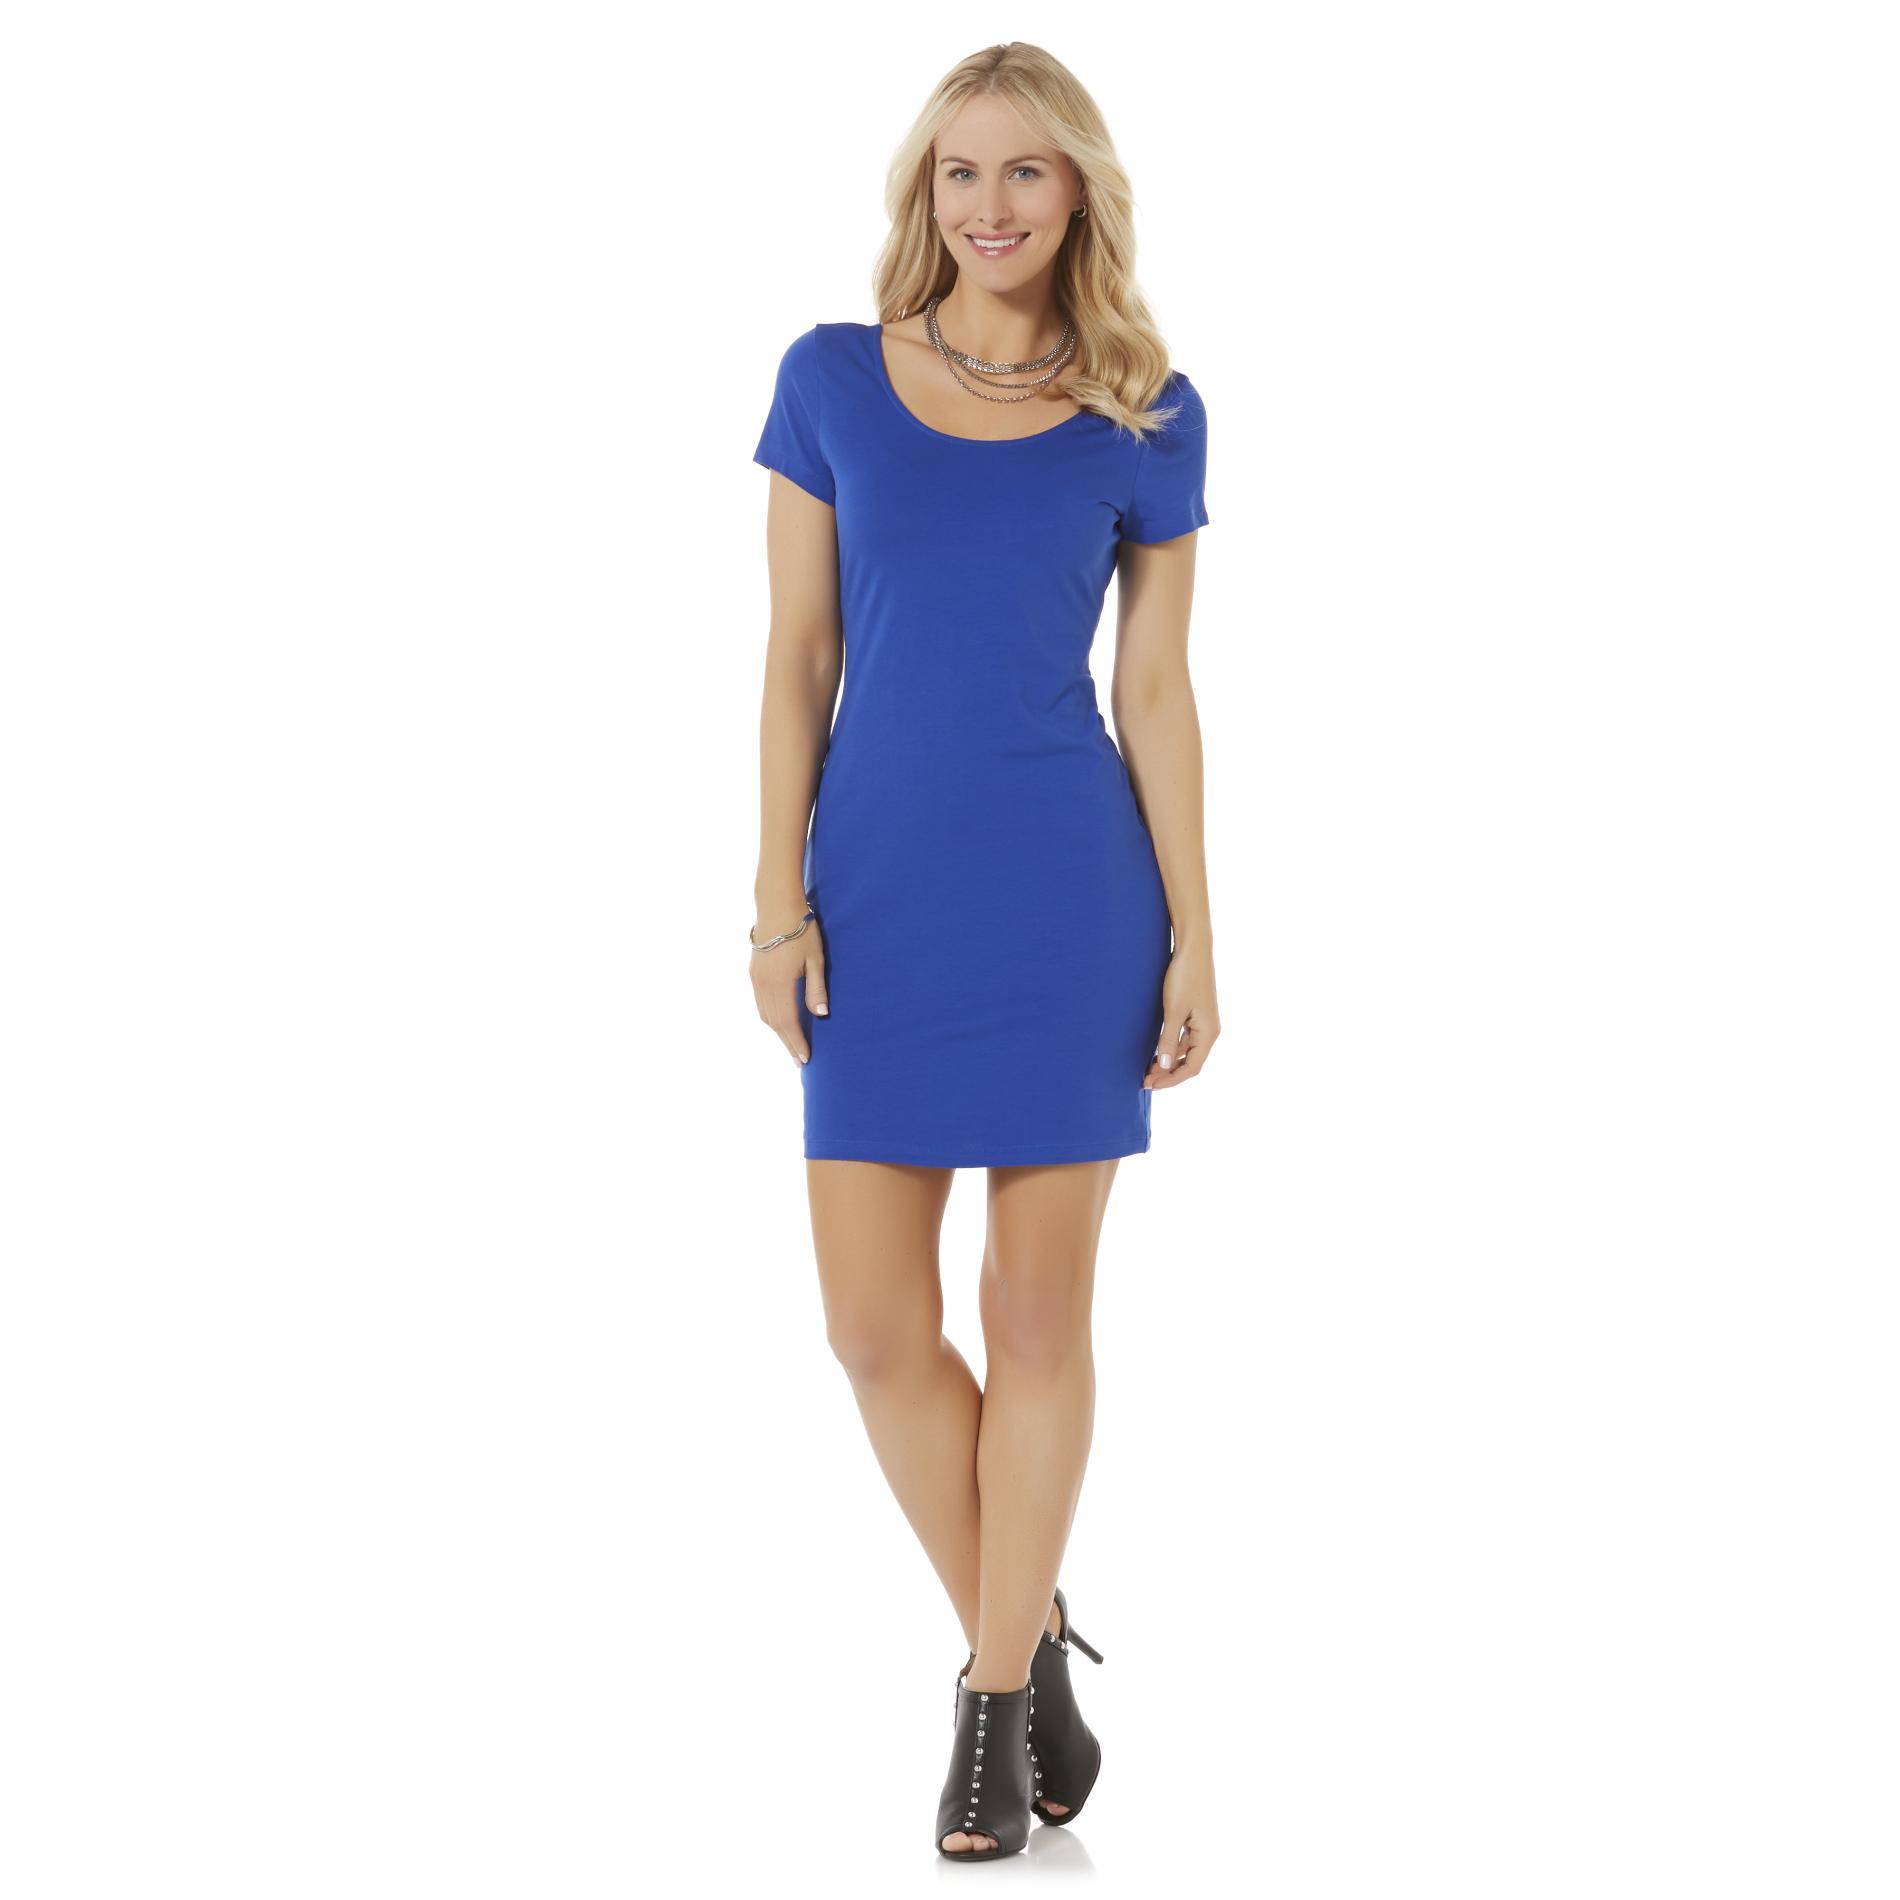 Women39s TShirt Dress Shop Basics at Kmart